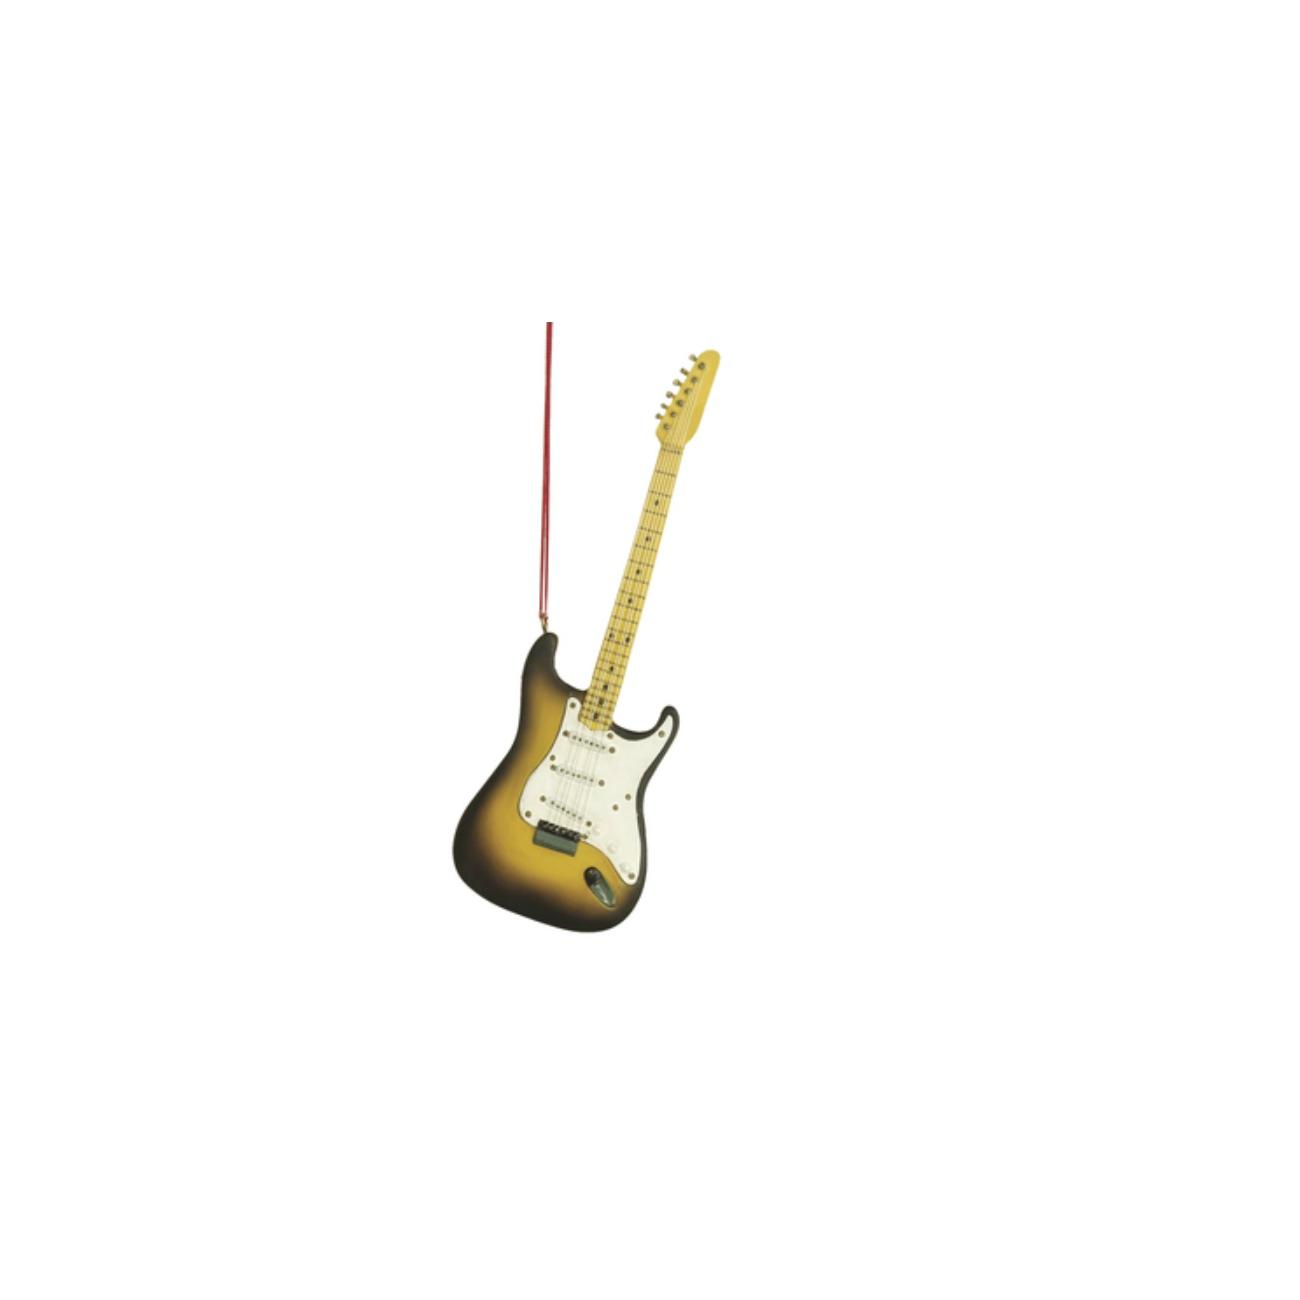 Guitar Fan Pull Black Ornament